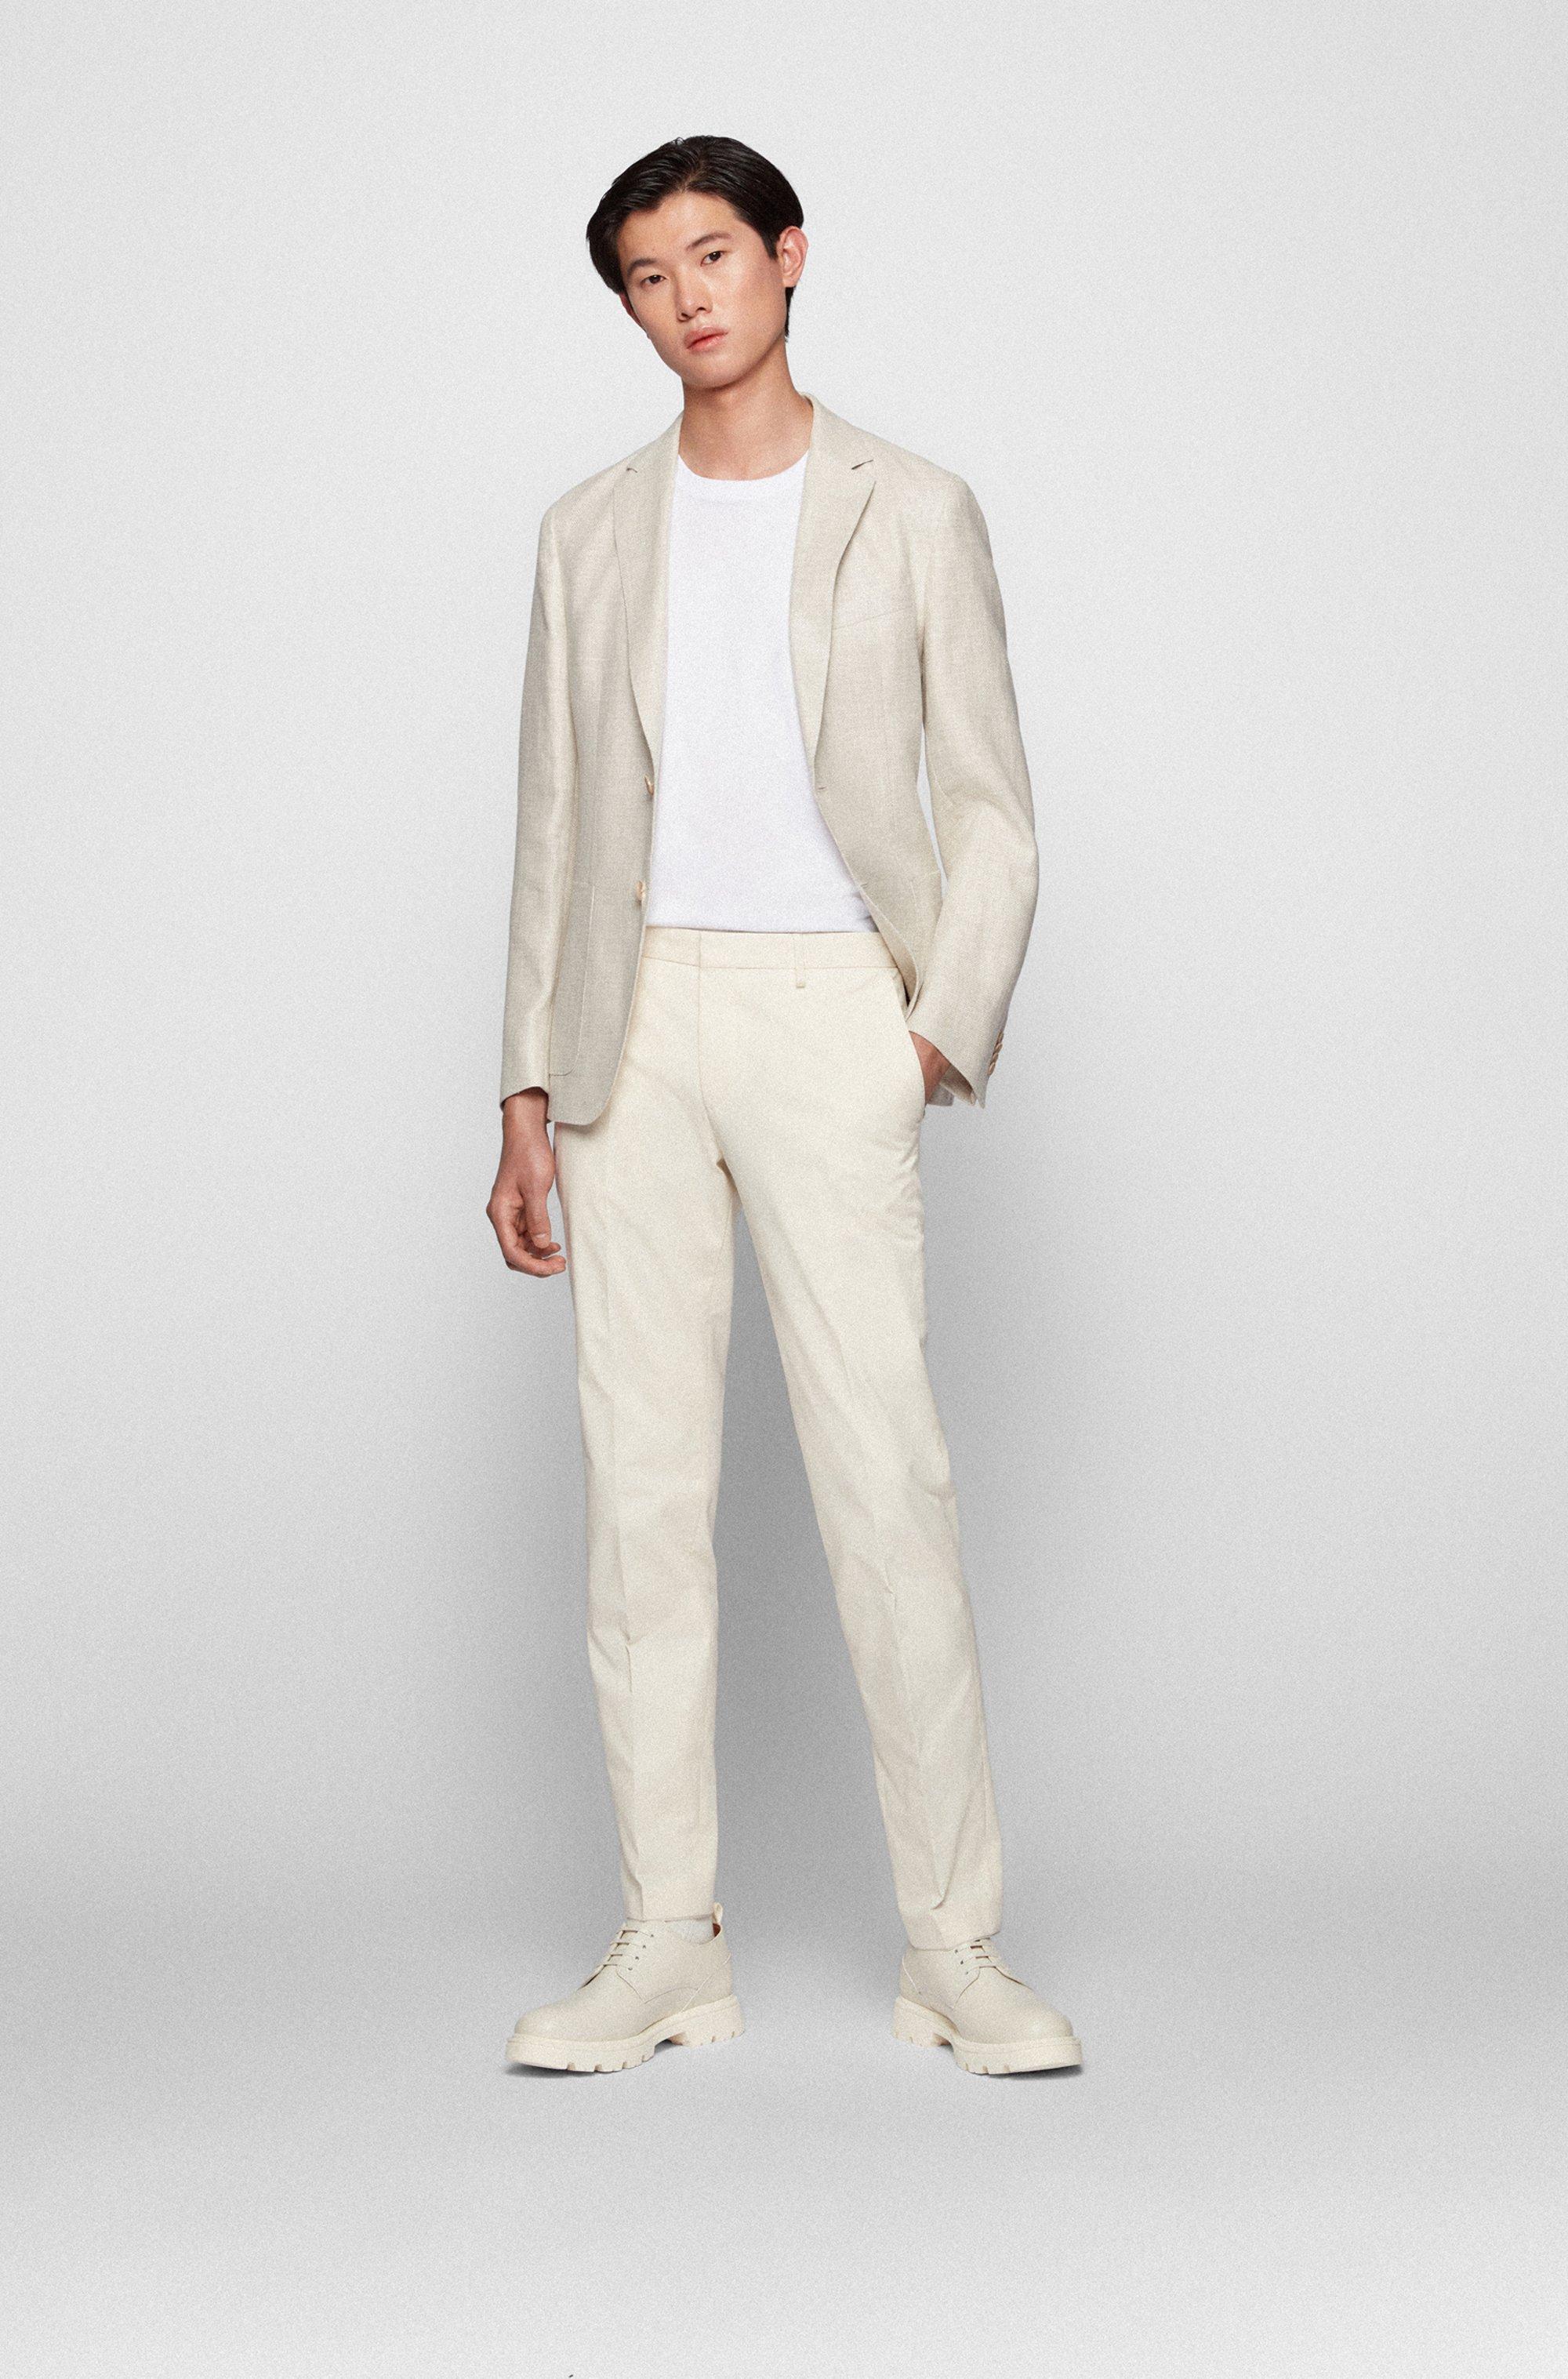 Slim-fit jacket in patterned hemp and wool